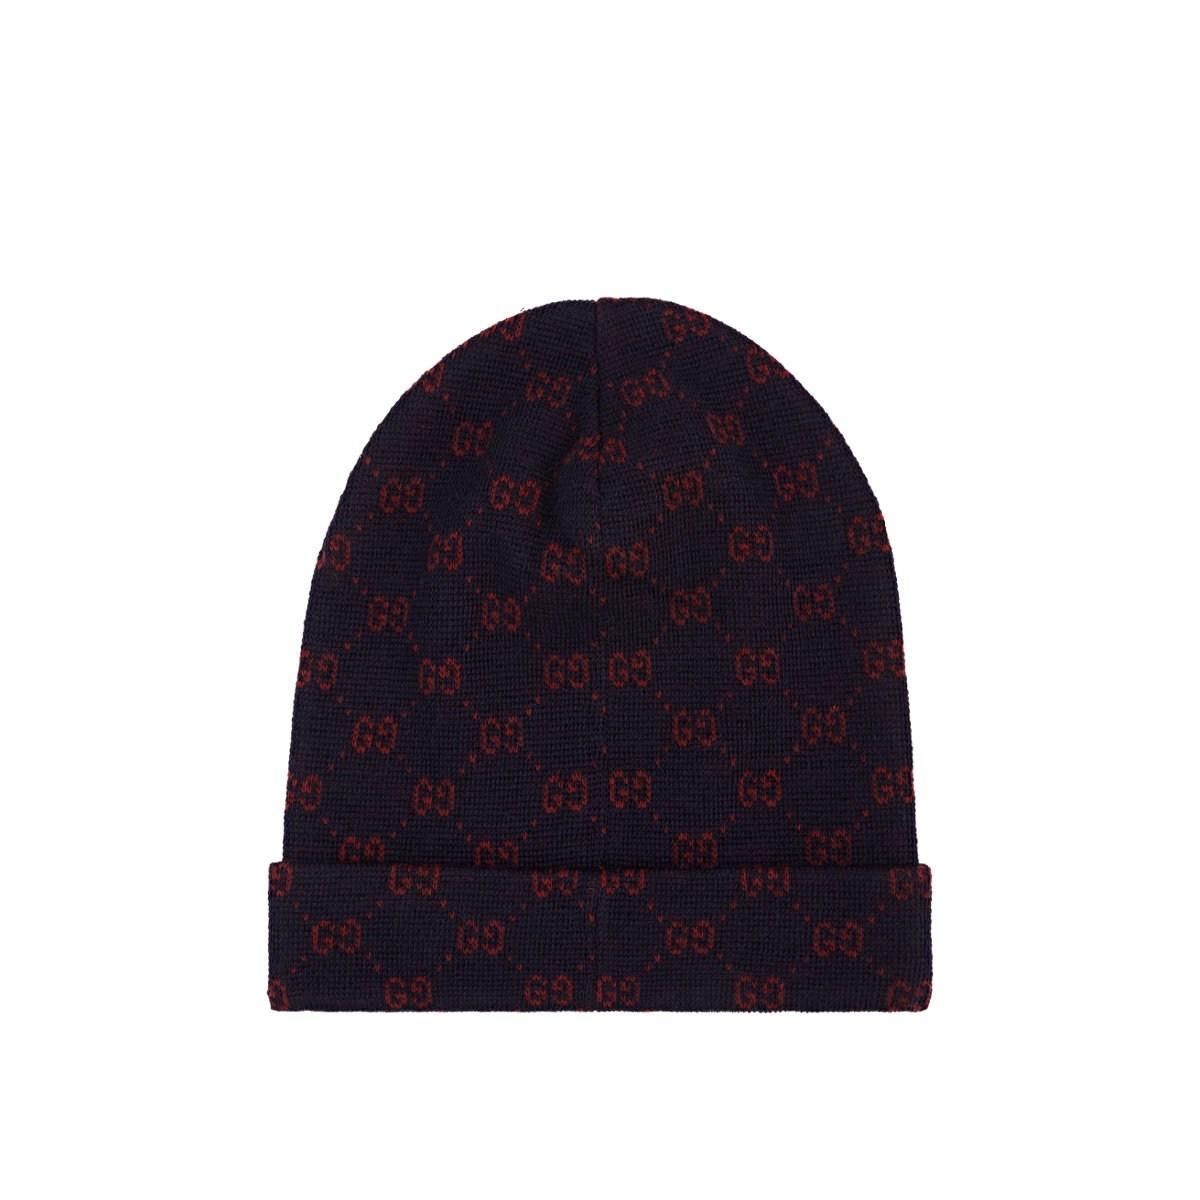 Gucci - Blue Double-g Alpaca-wool Beanie for Men - Lyst. View fullscreen 01919e12ada0